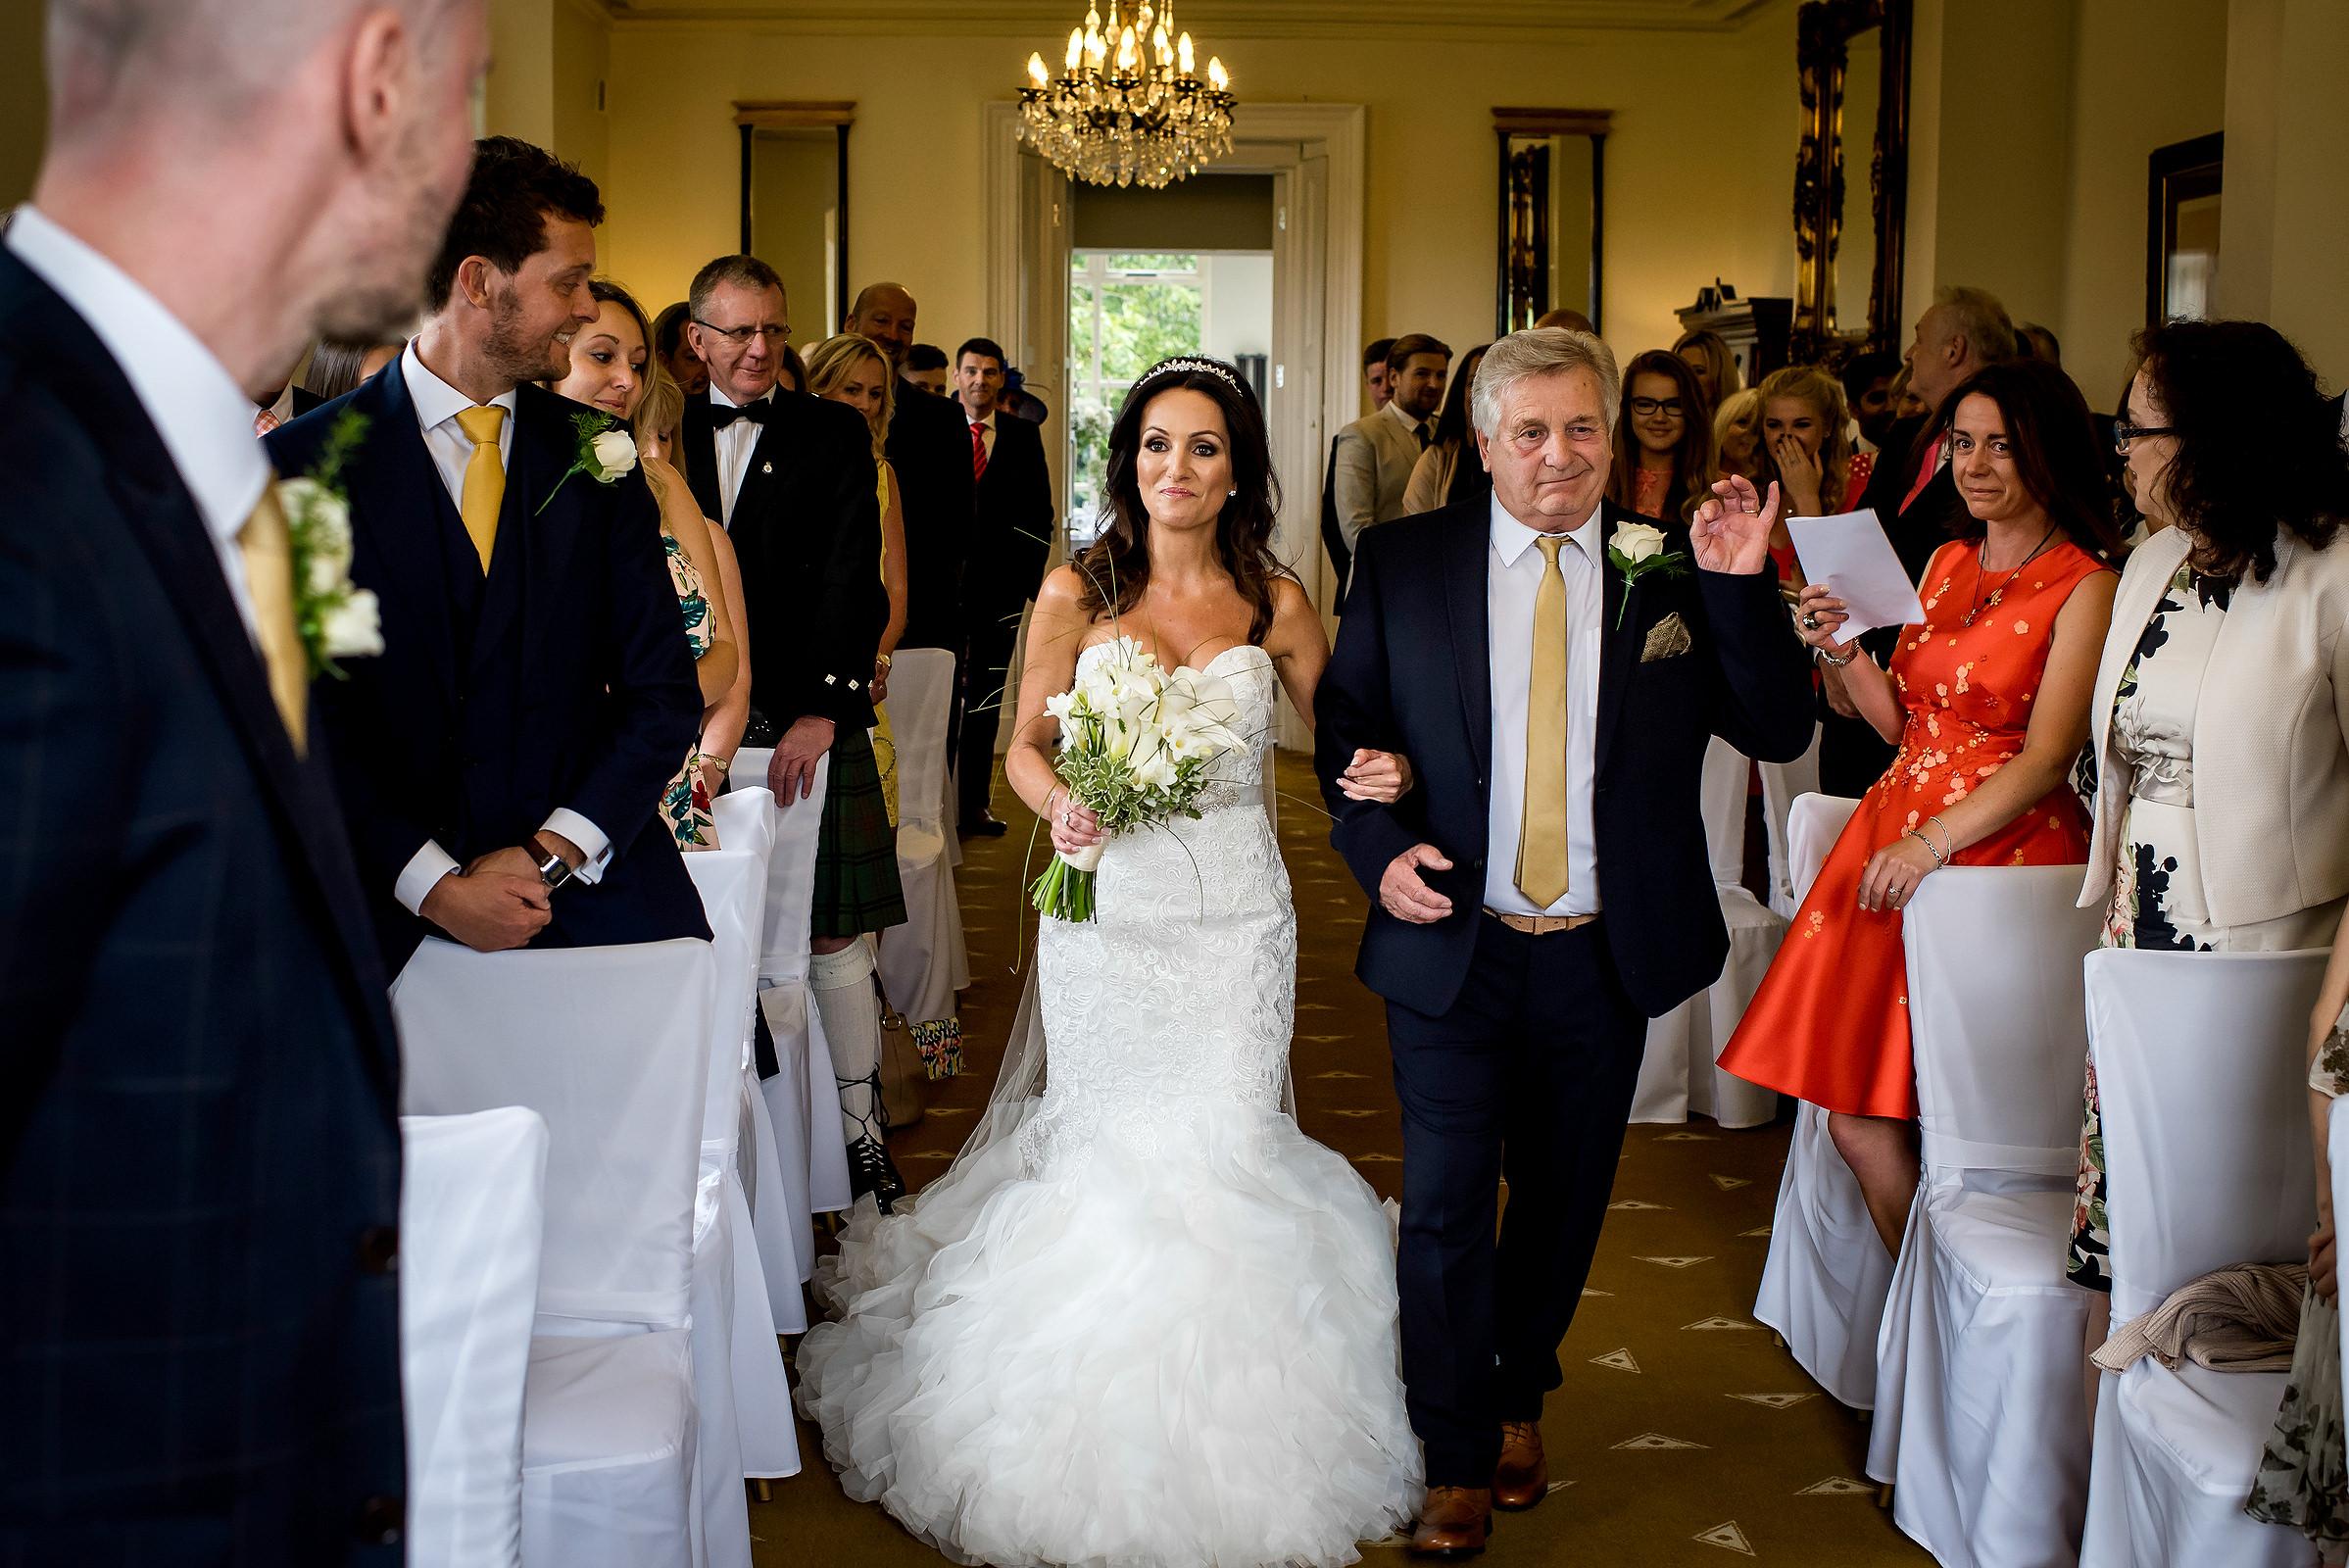 Wedding ceremonies at Shottle Hall